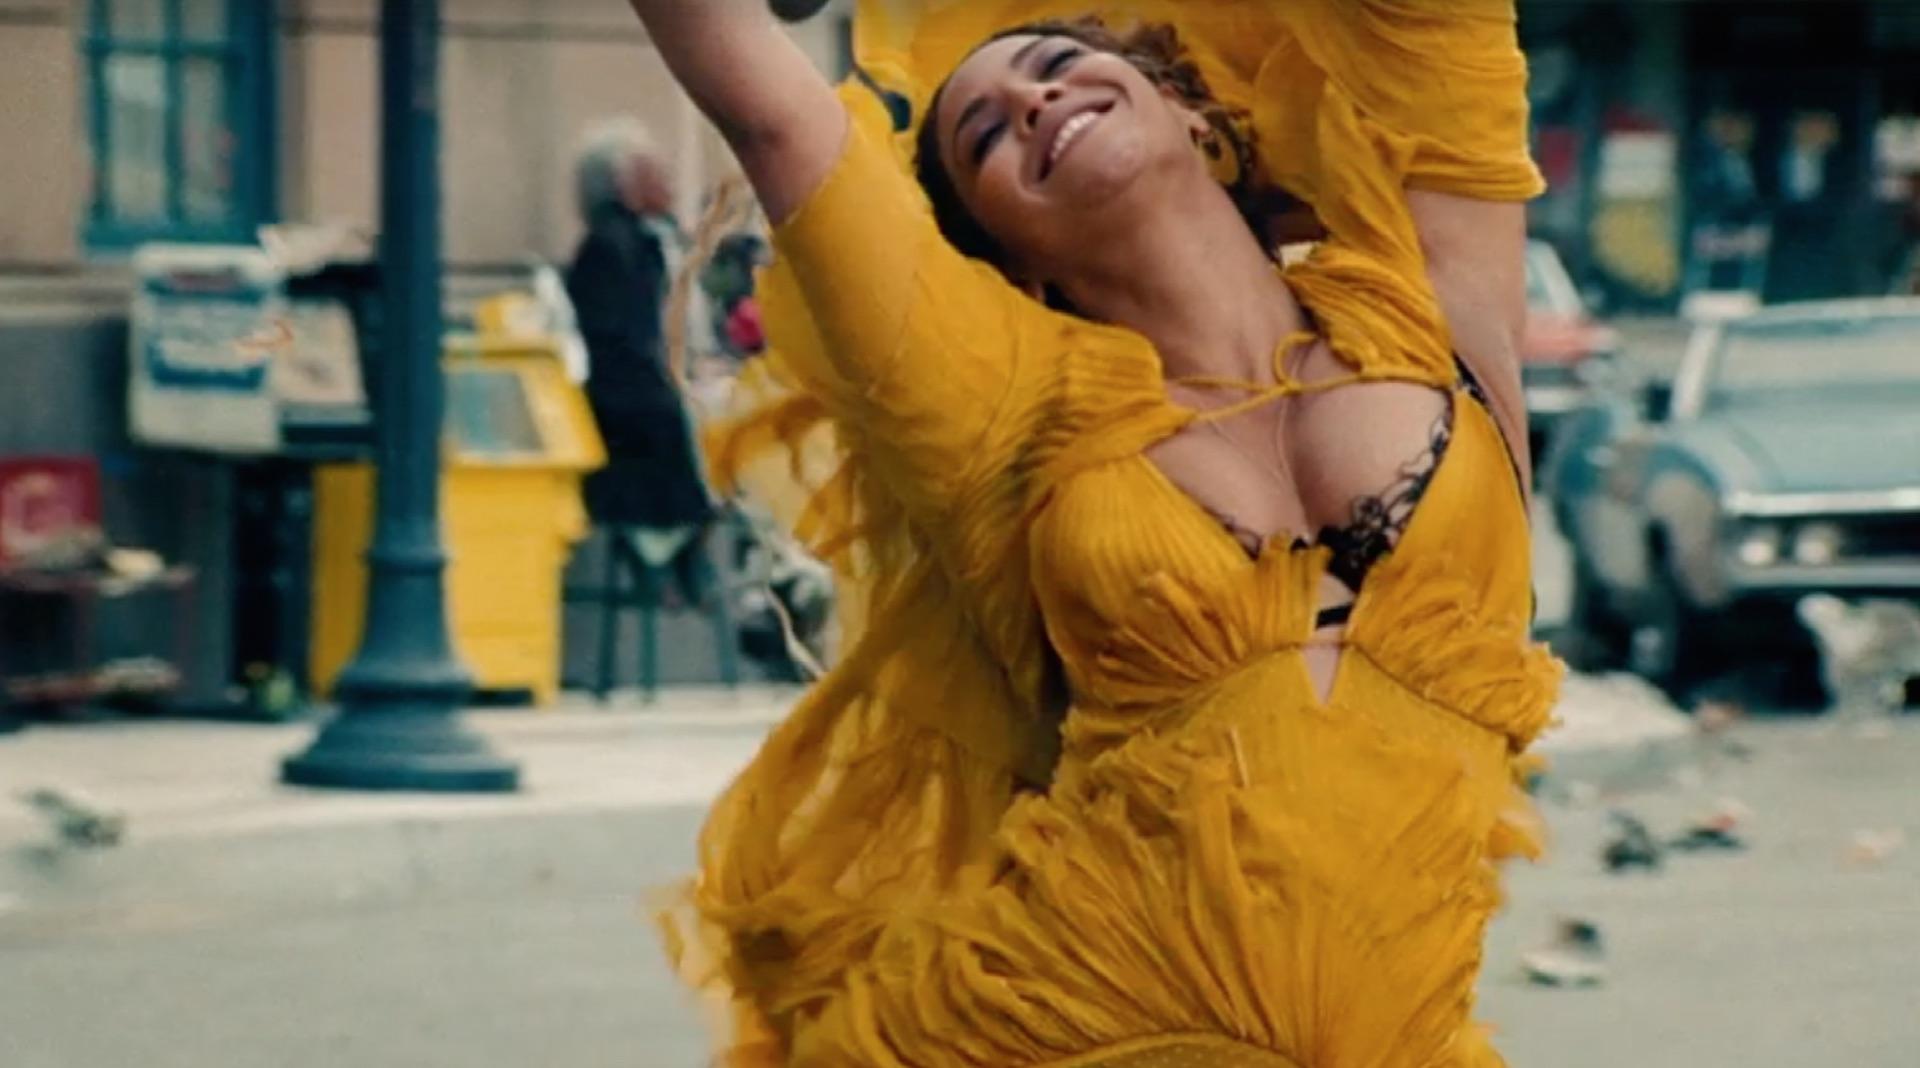 Listen to Beyoncé's Lemonade: it's streaming now